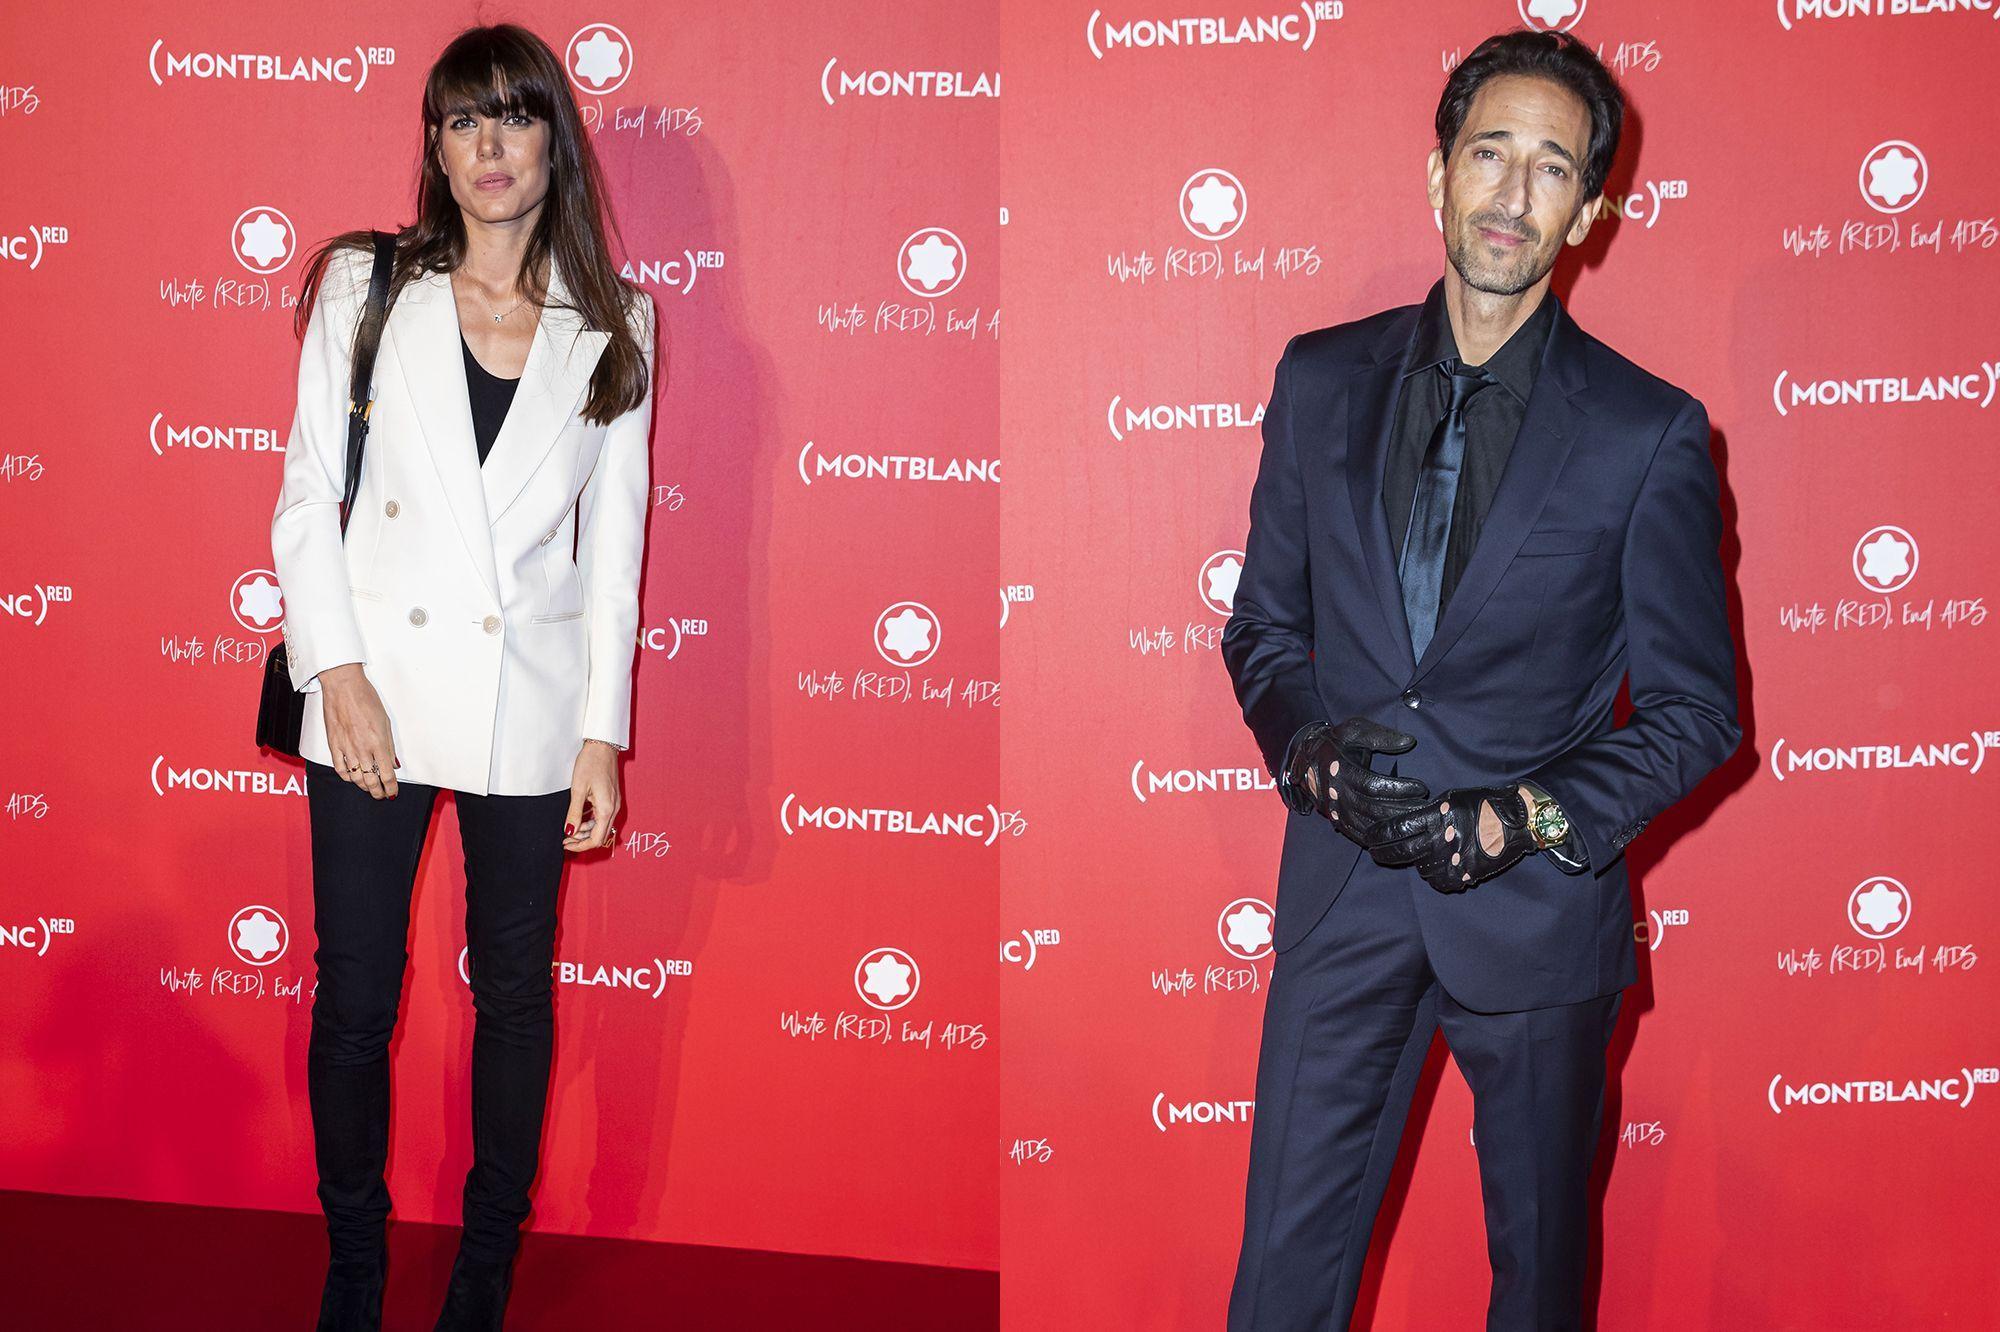 Charlotte Casiraghi et Adrien Brody, duo chic pour Montblanc